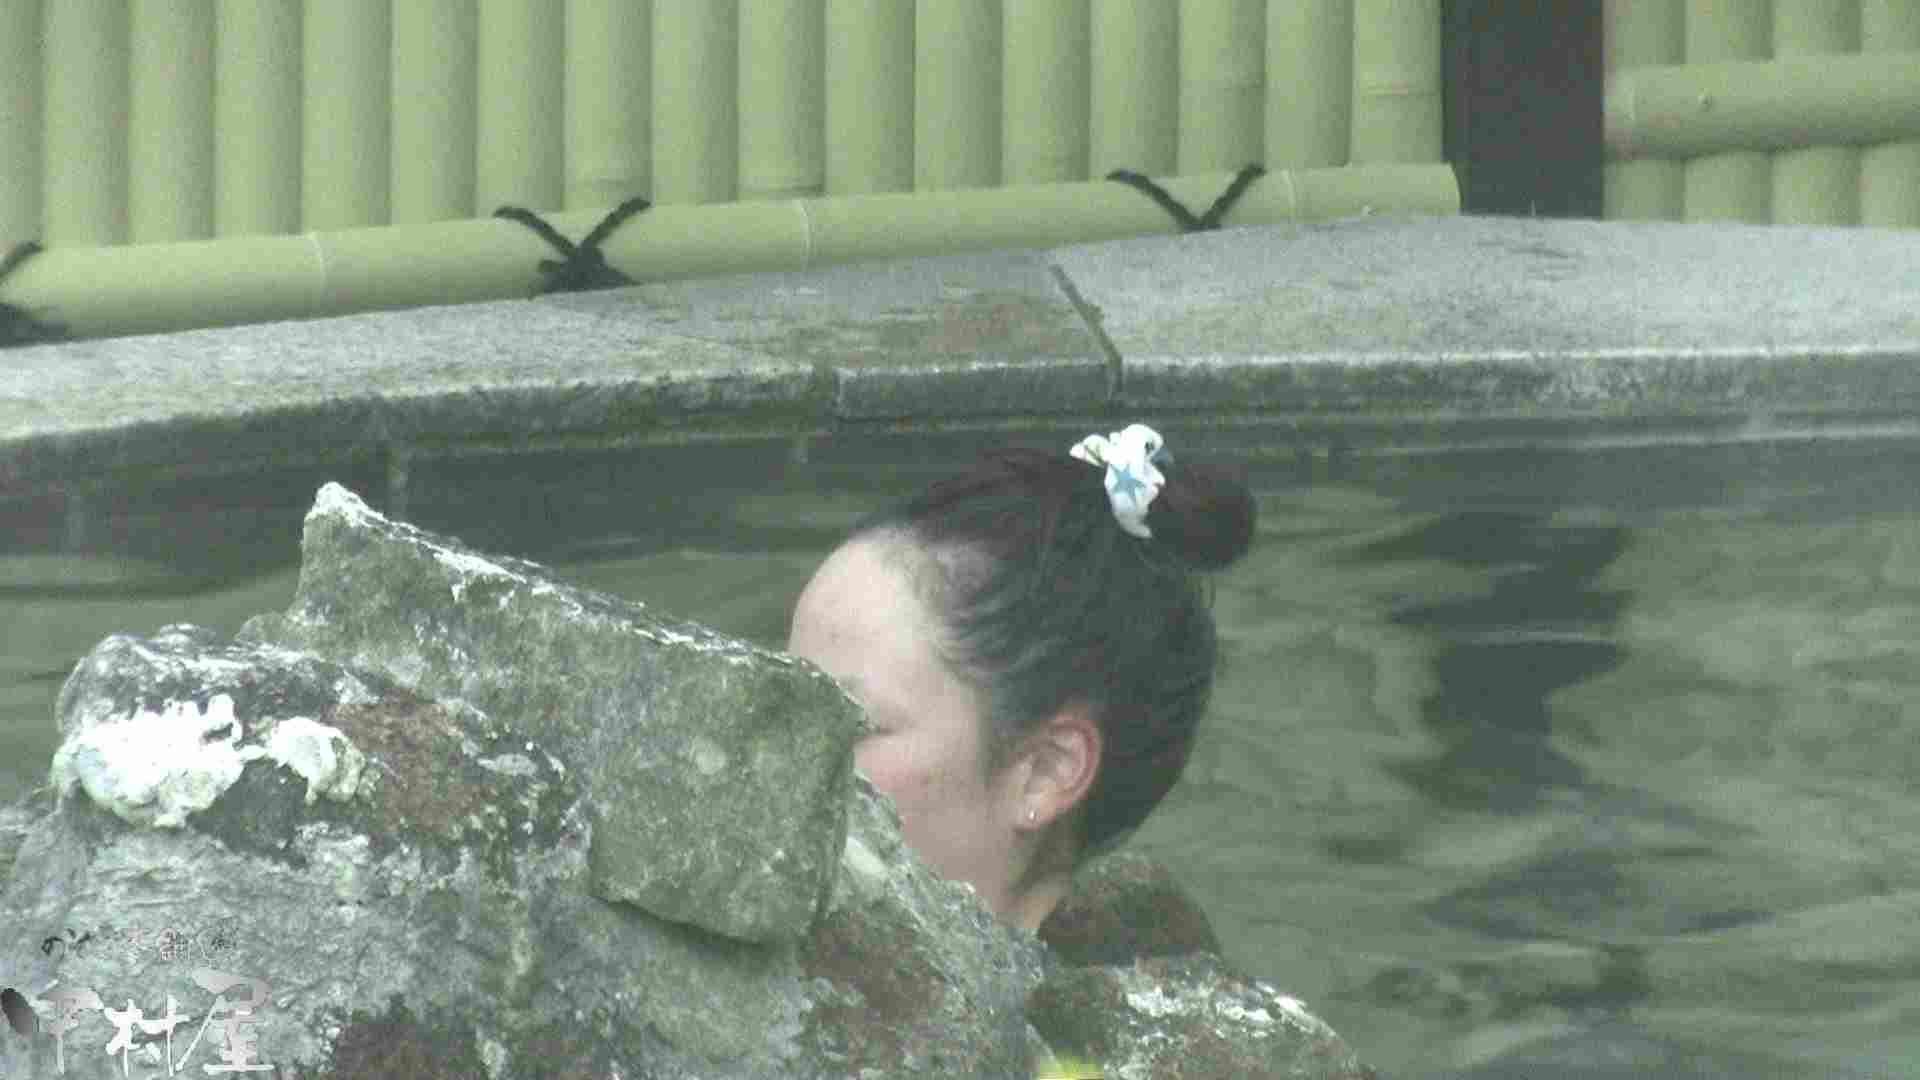 Aquaな露天風呂Vol.911 OLセックス 隠し撮りすけべAV動画紹介 107画像 23